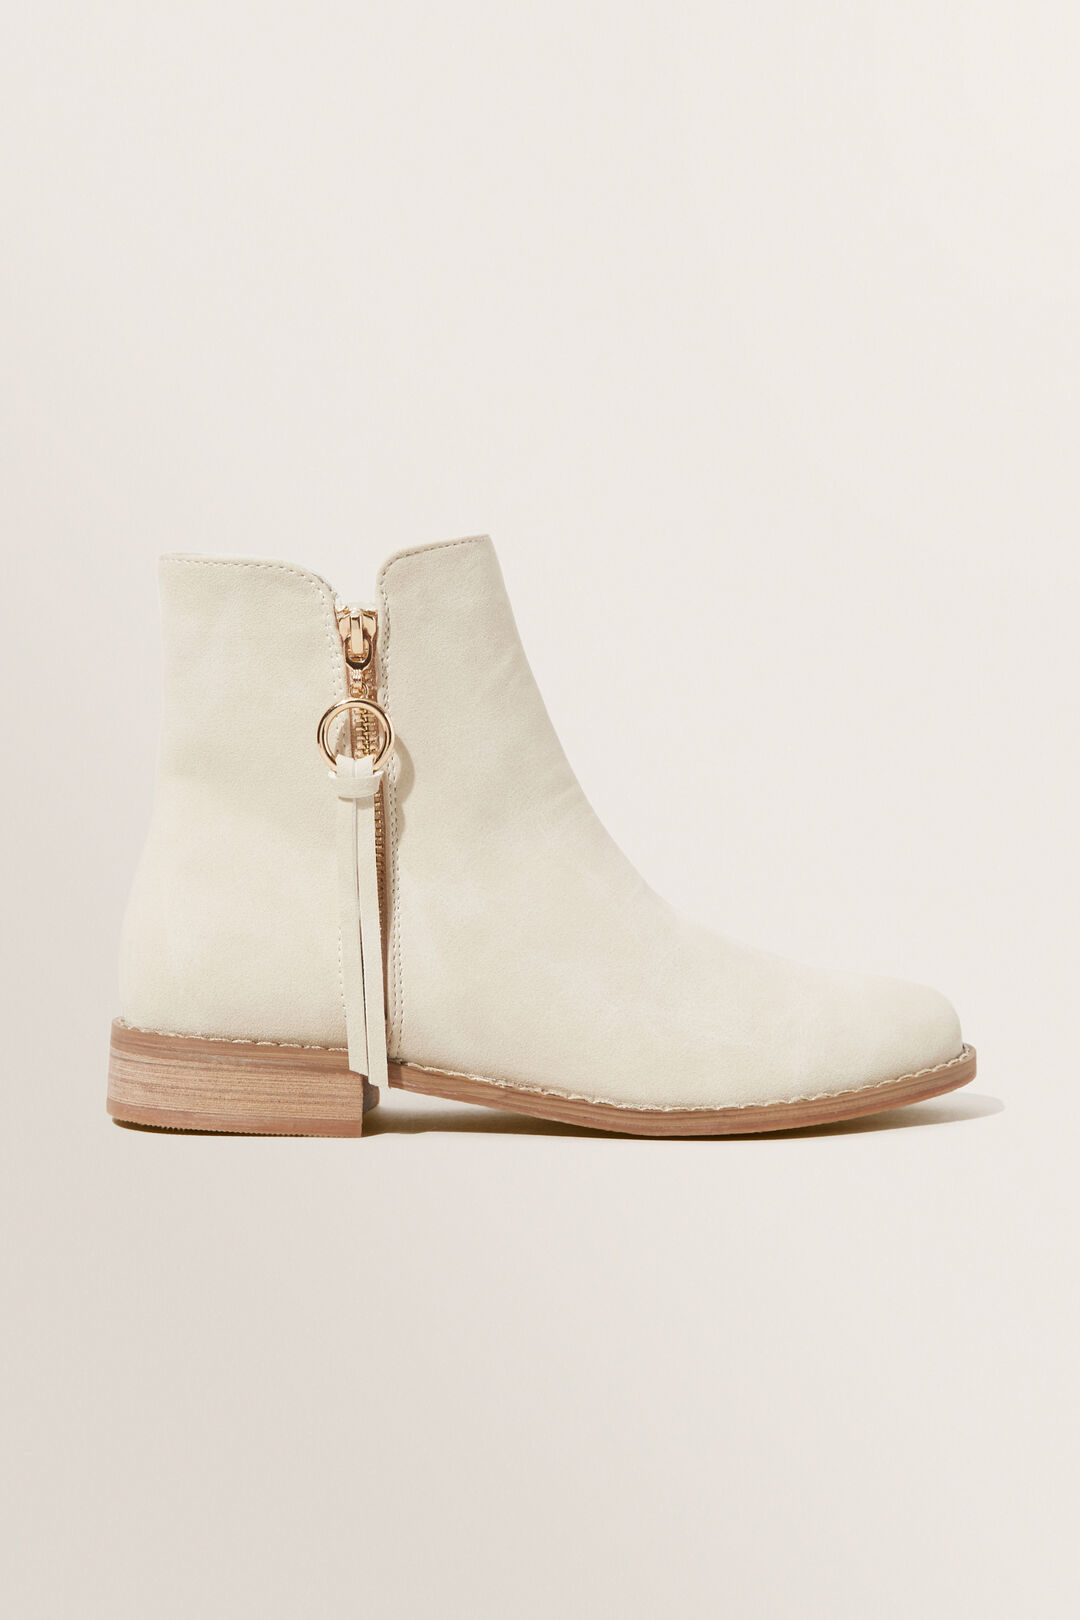 Tassel Zip Boot  STONE  hi-res